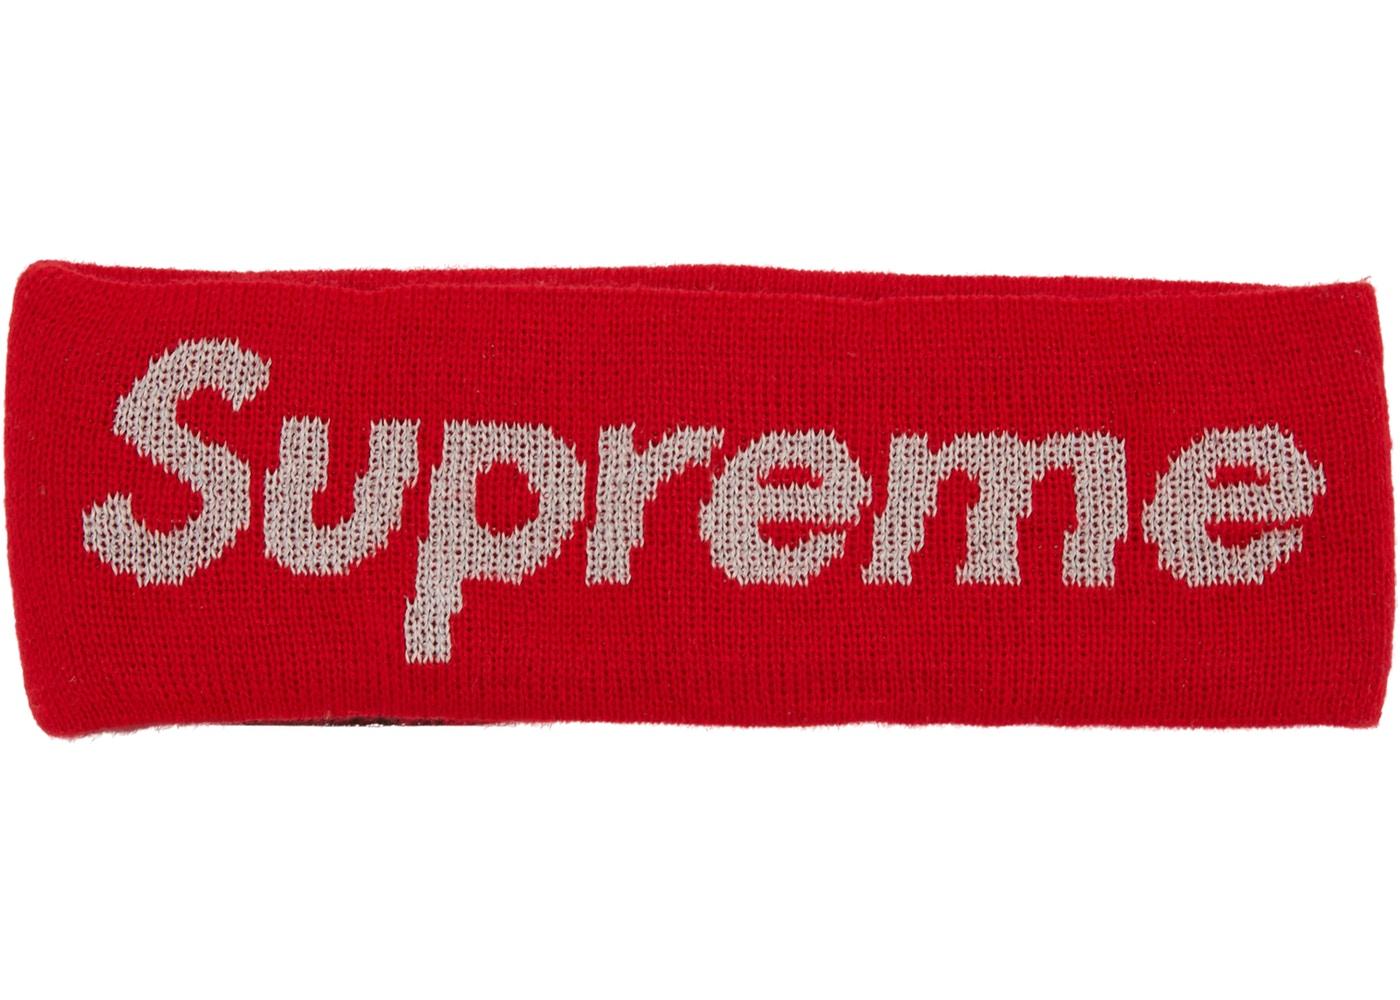 supreme headband review